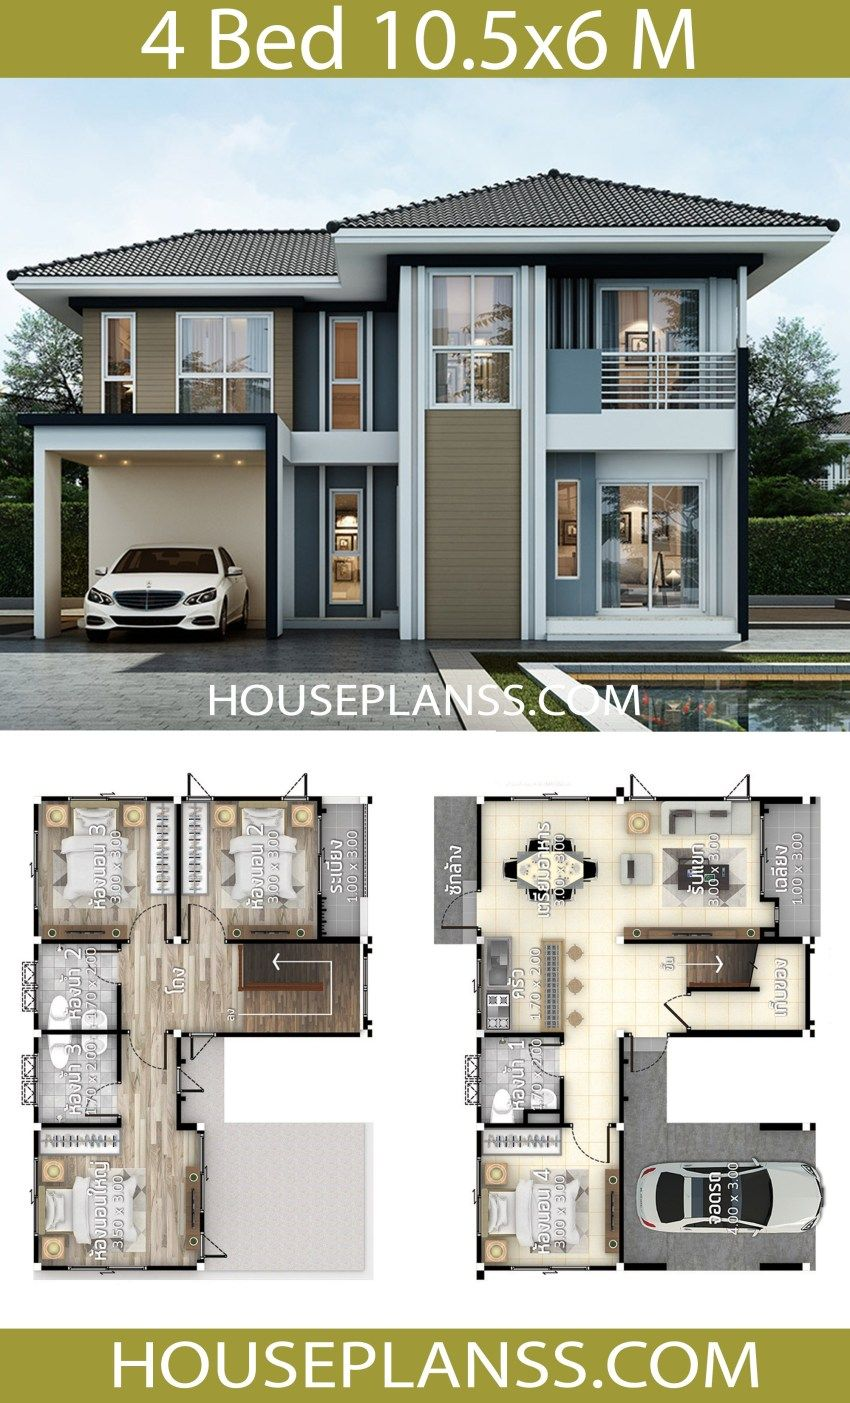 House Plans Idea 10 5x6 With 4 Bedrooms House Plans 3d House Construction Plan House Plan Gallery Bungalow House Design